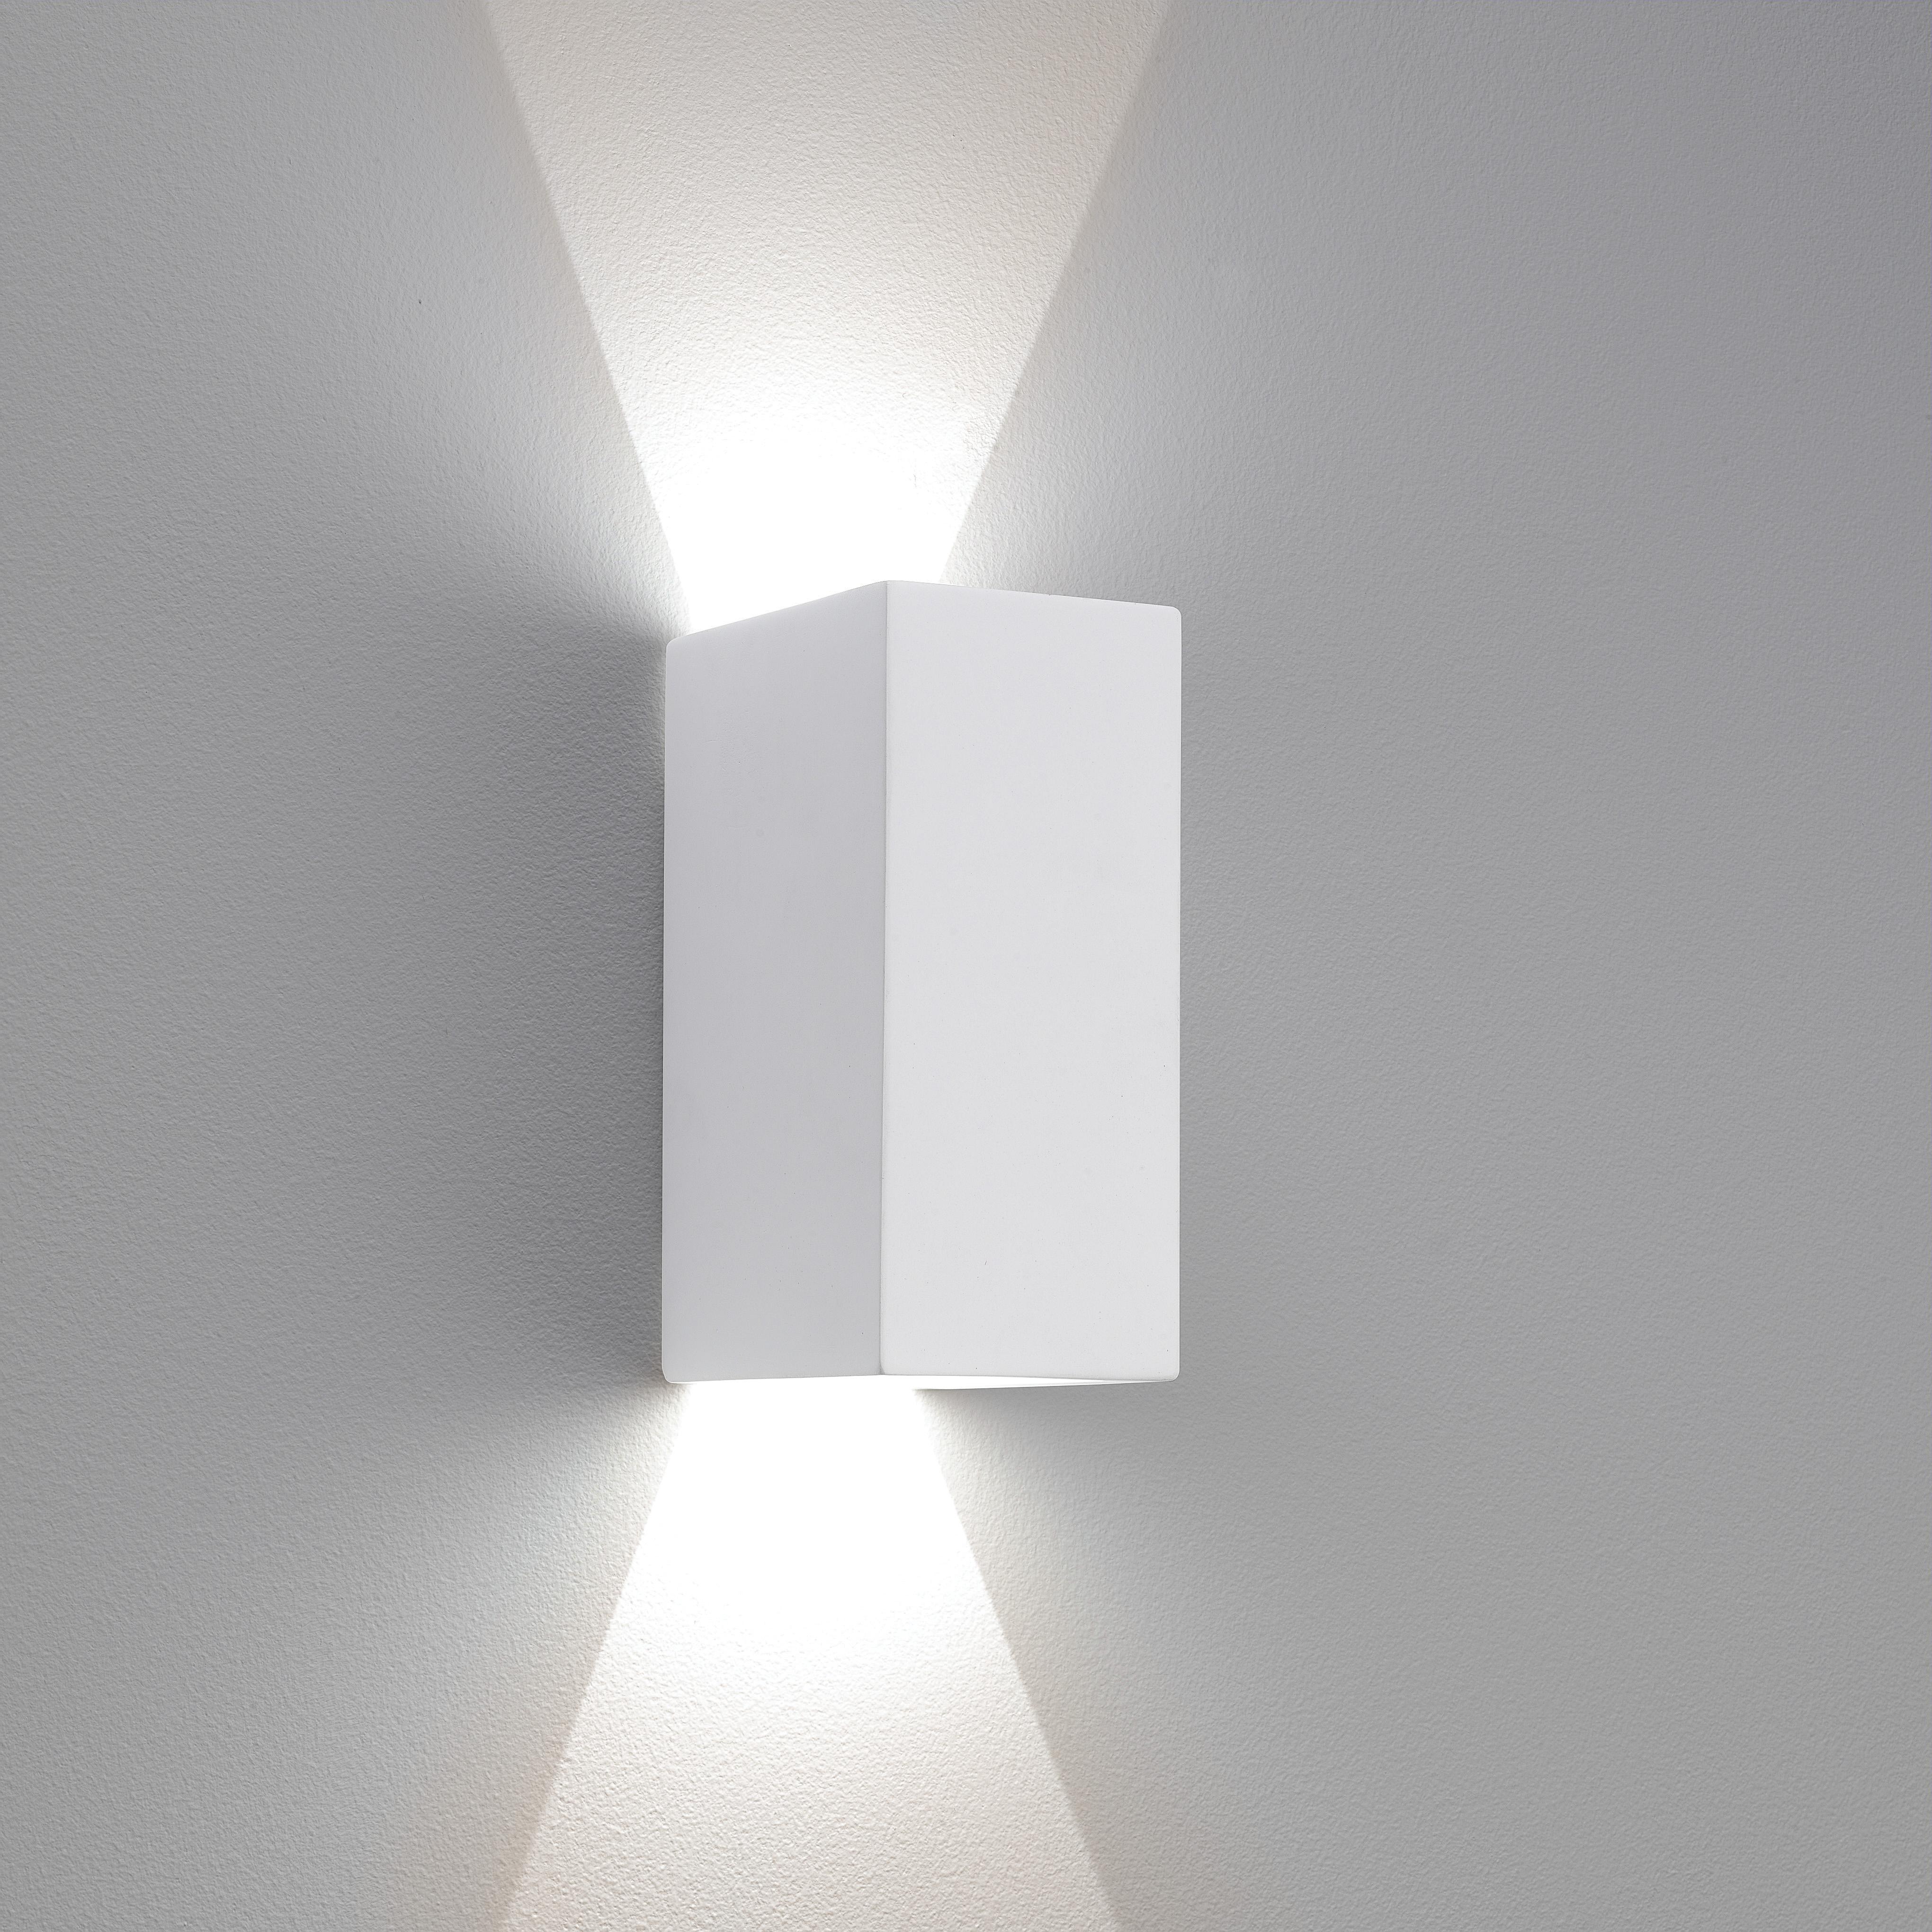 Astro 1187014 Parma 160 W/Lgt c/w LEDs